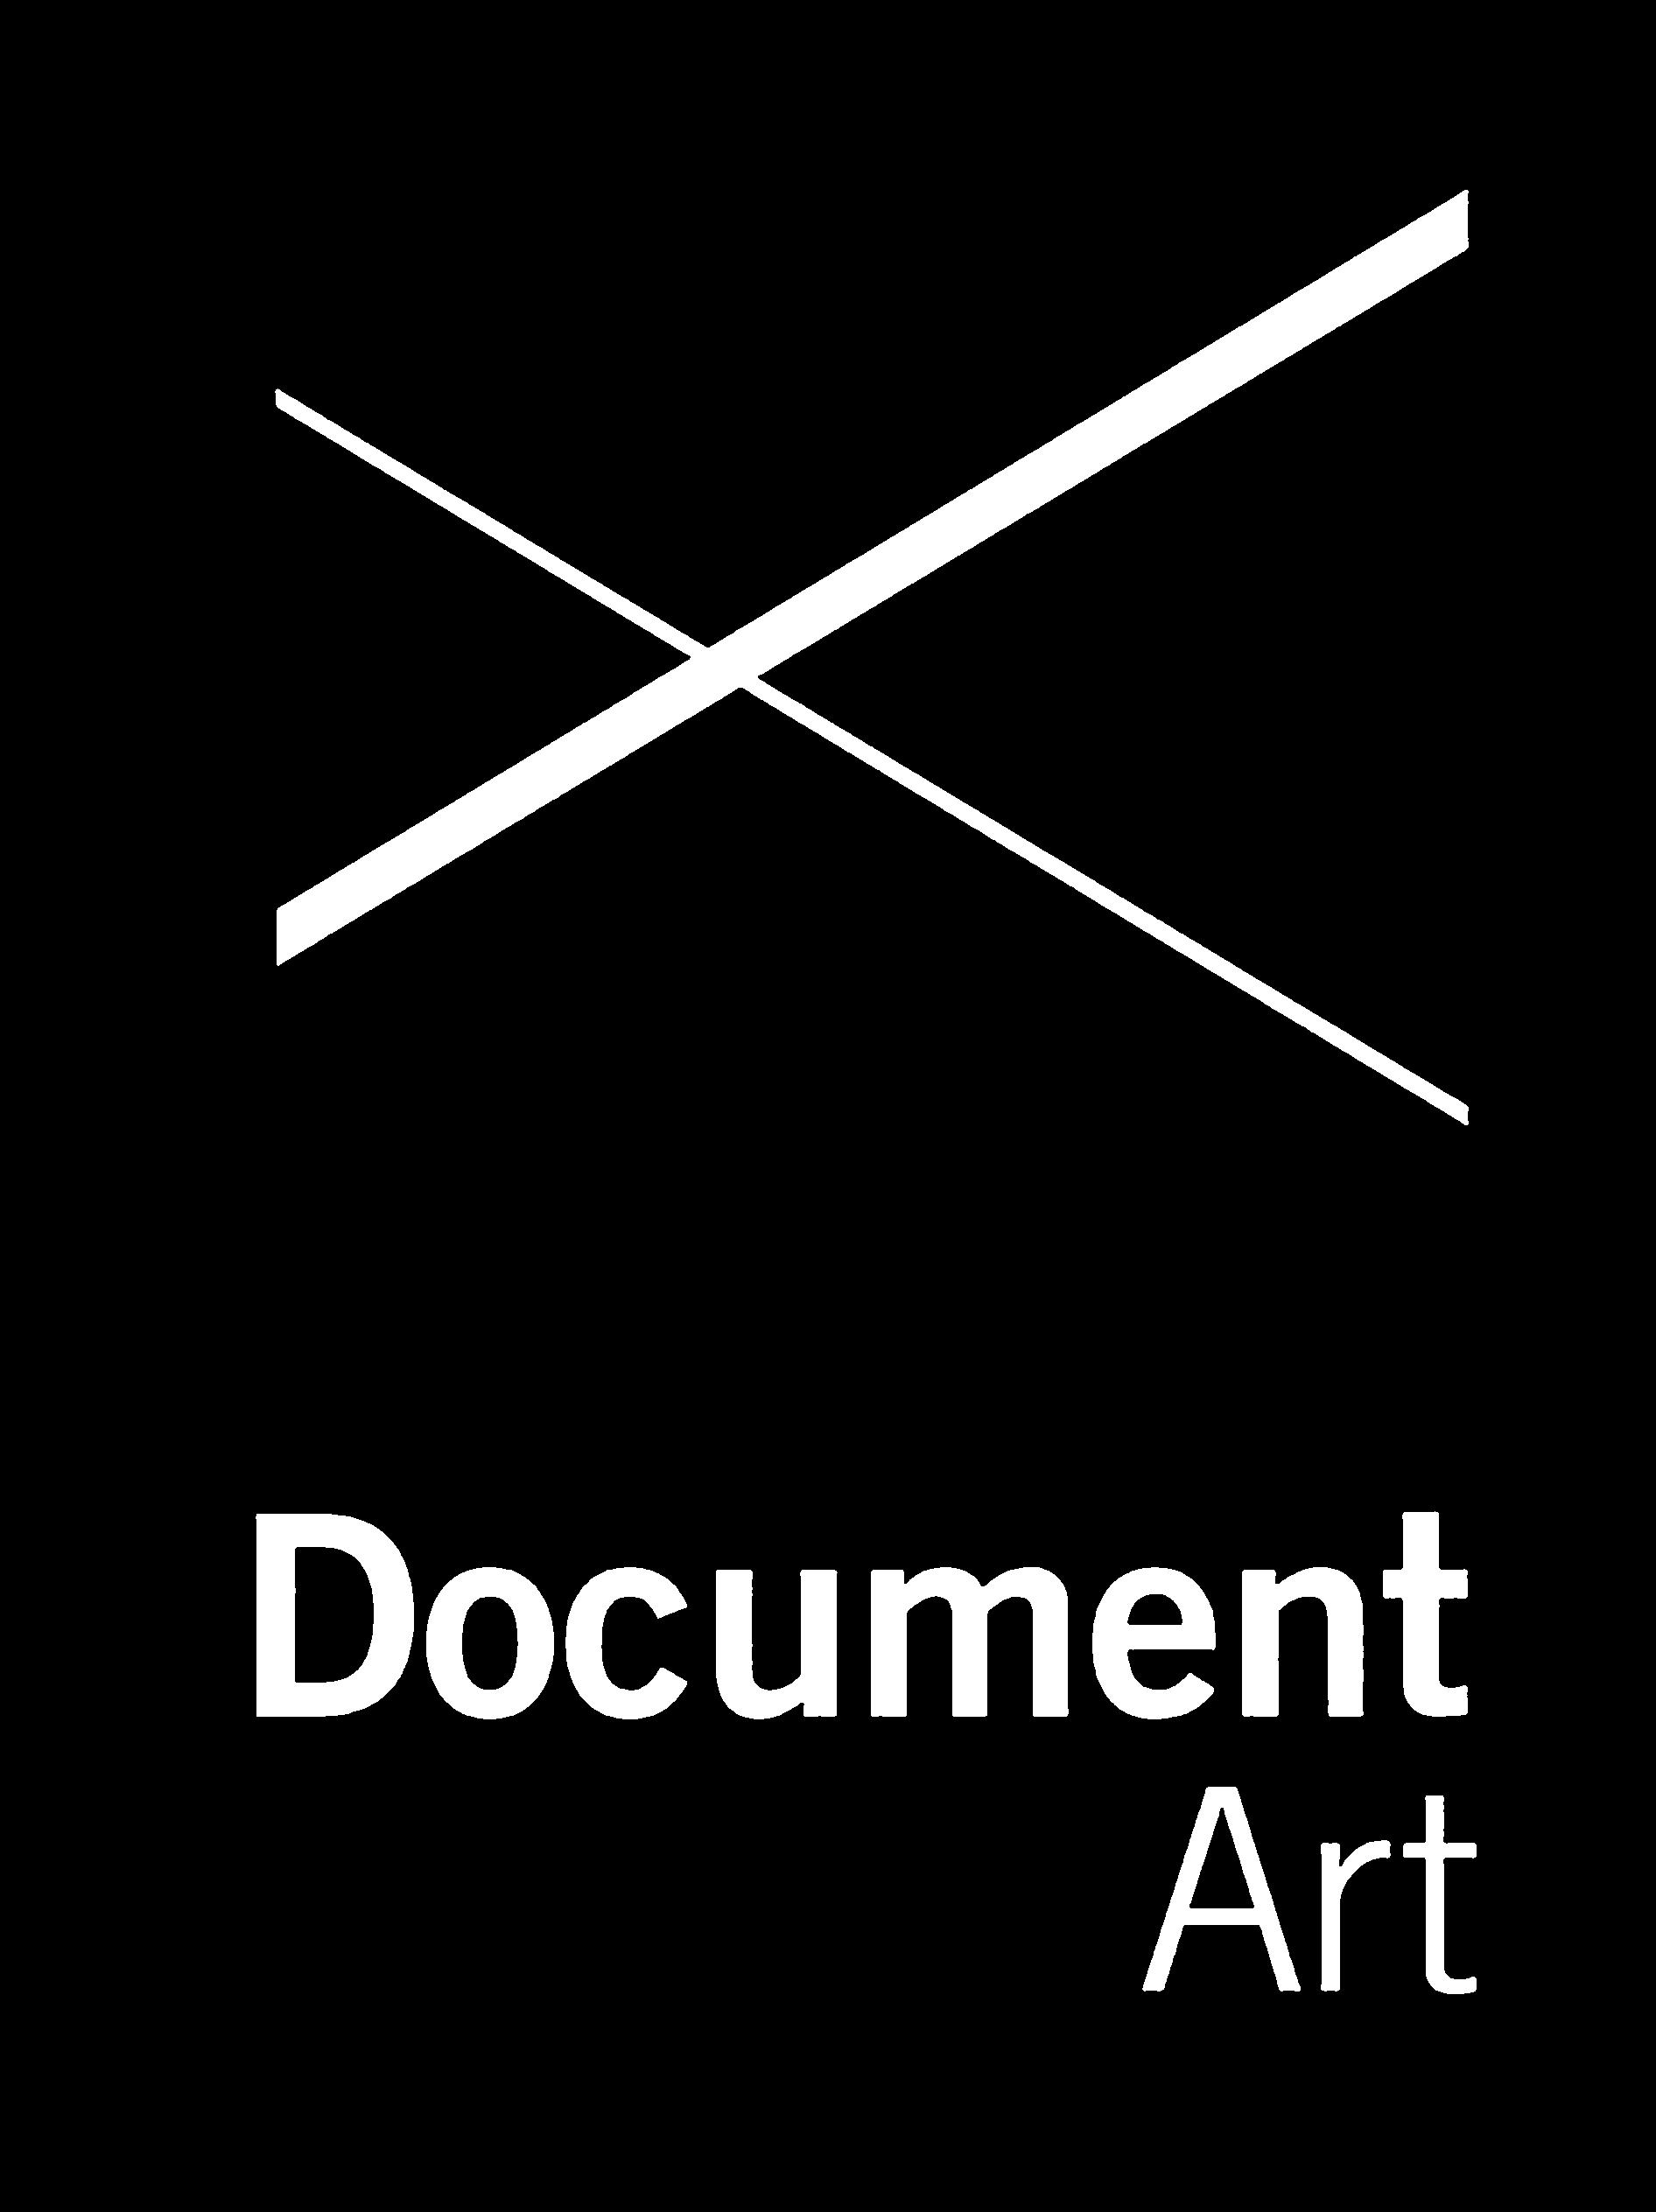 Document Art